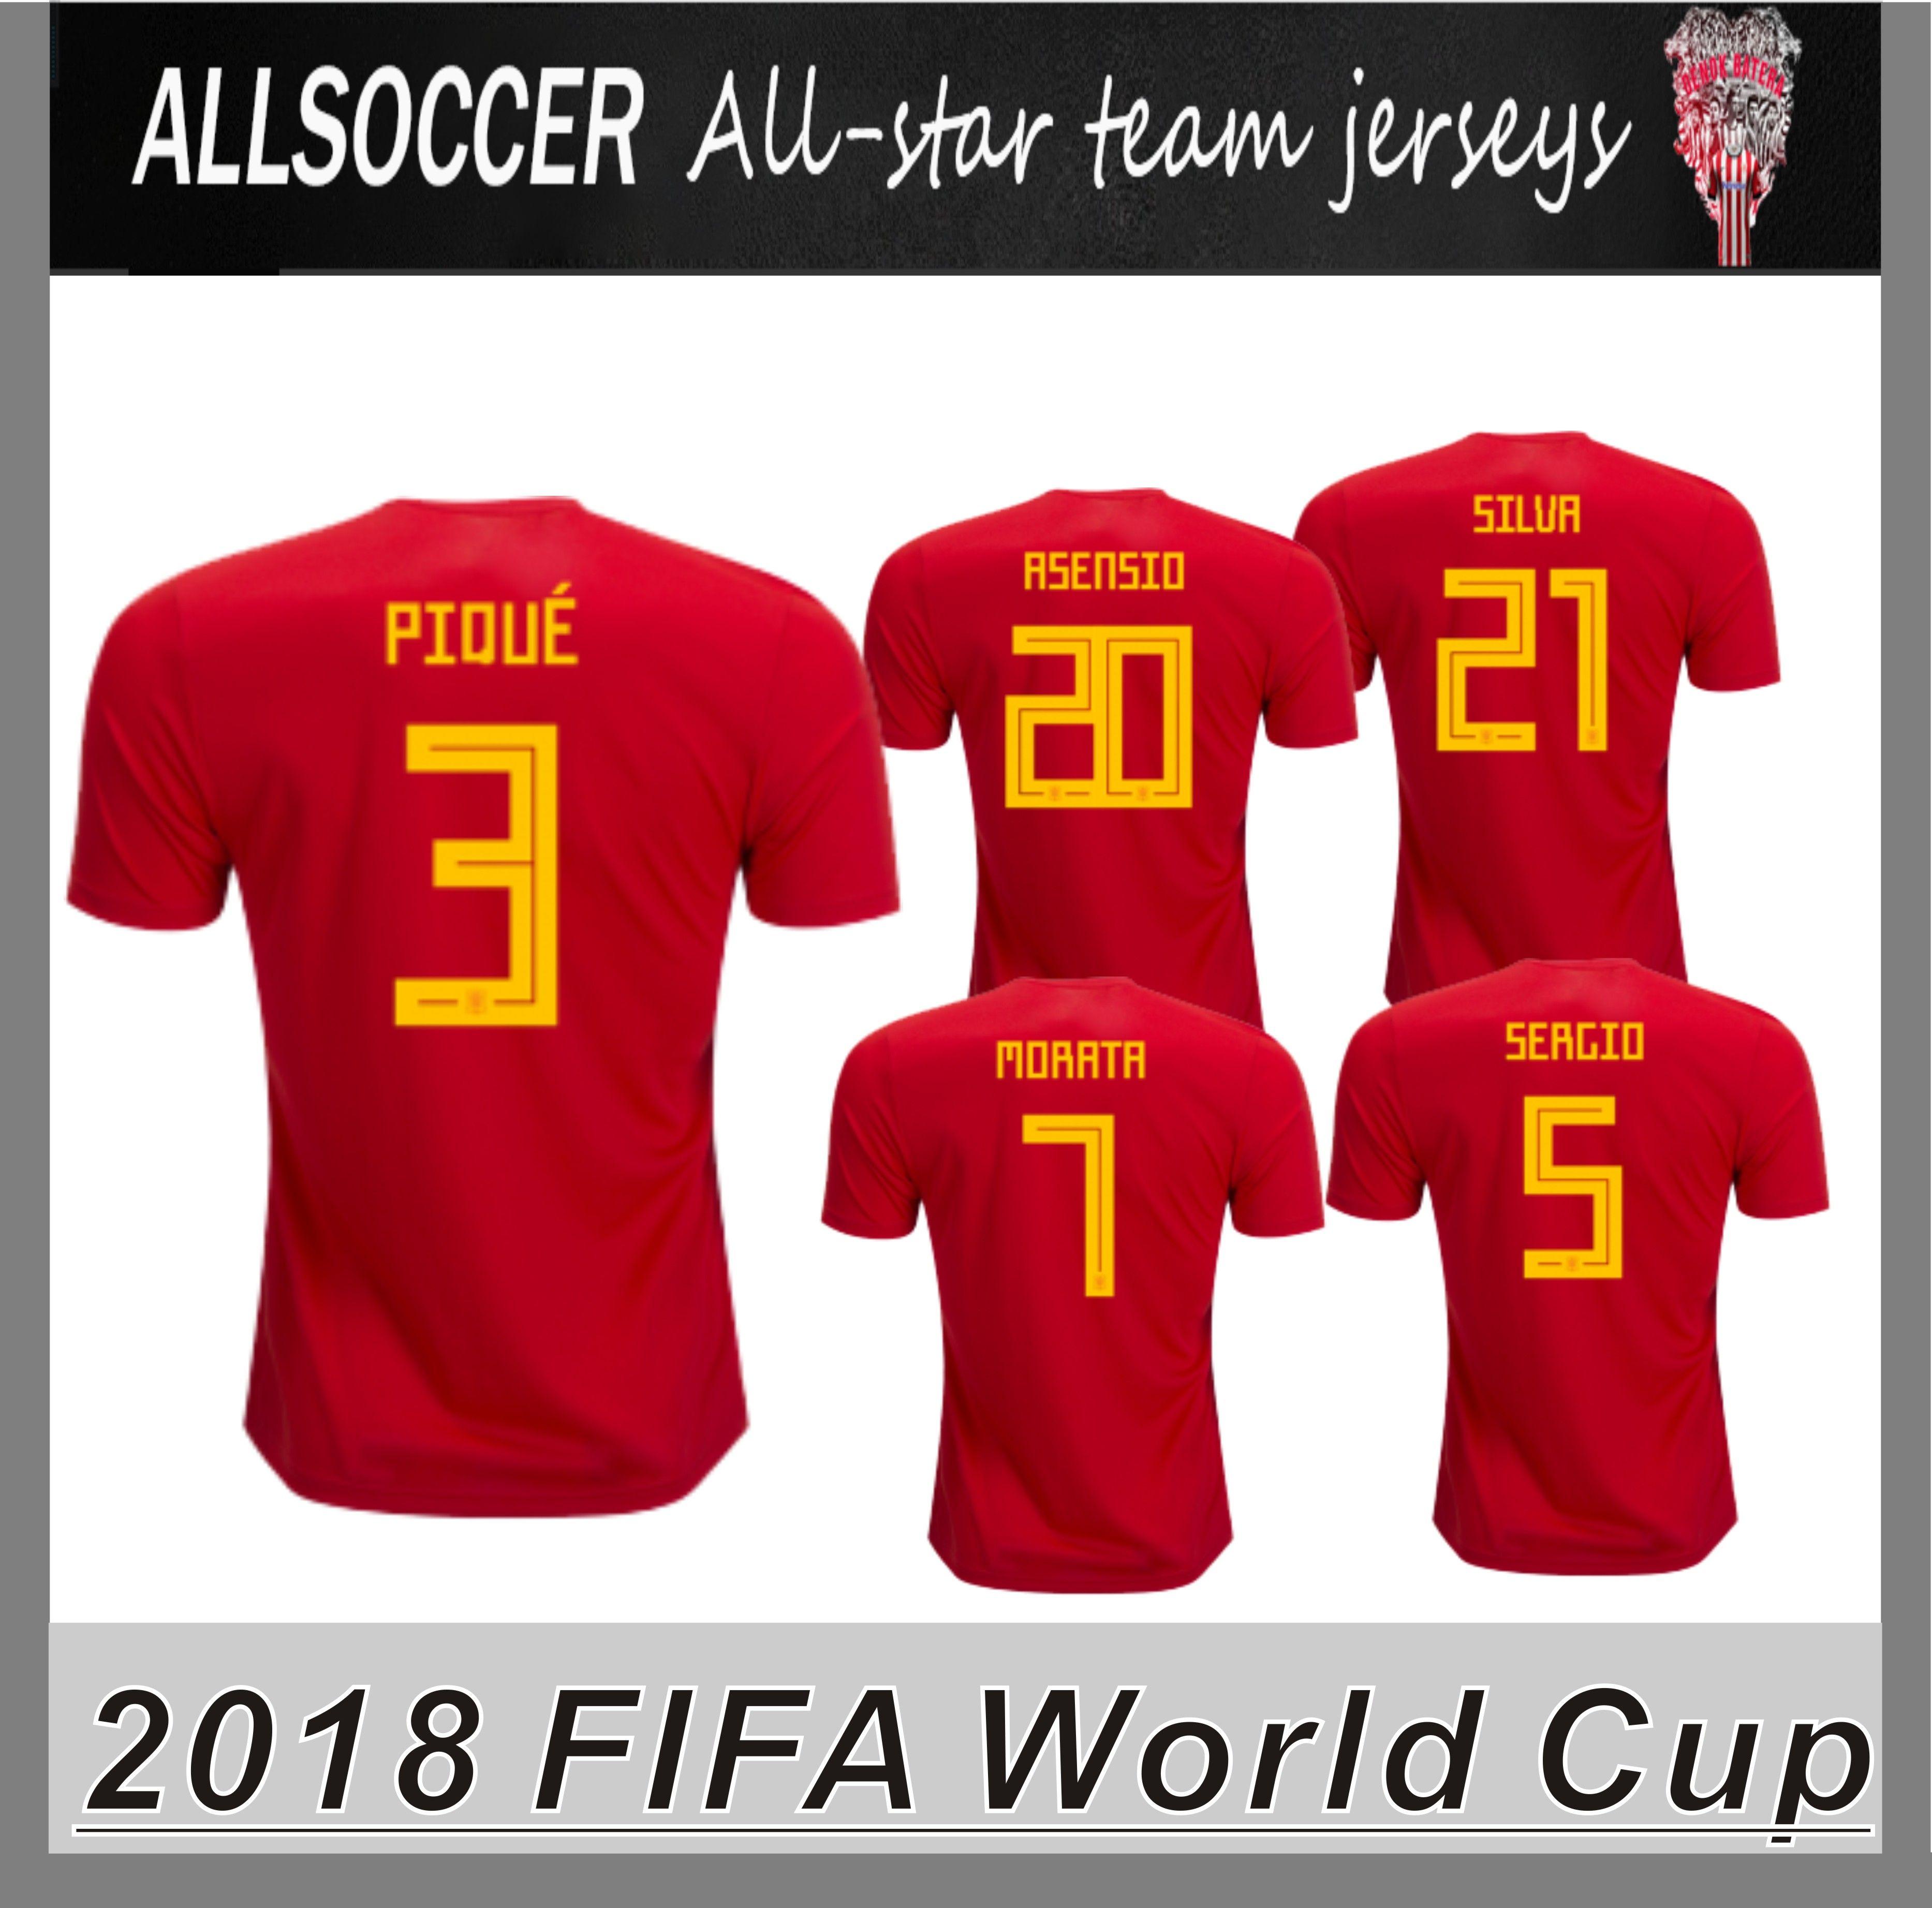 Copa Mundial 2018 JERSEYS España Inicio Camisetas De Fútbol Marco Asensio  Pique ISCO Andrés Iniesta Sergio Ramos Alvaro Morata Sergio Busquets Por  Allsoccer ... 1fb4594c5e2